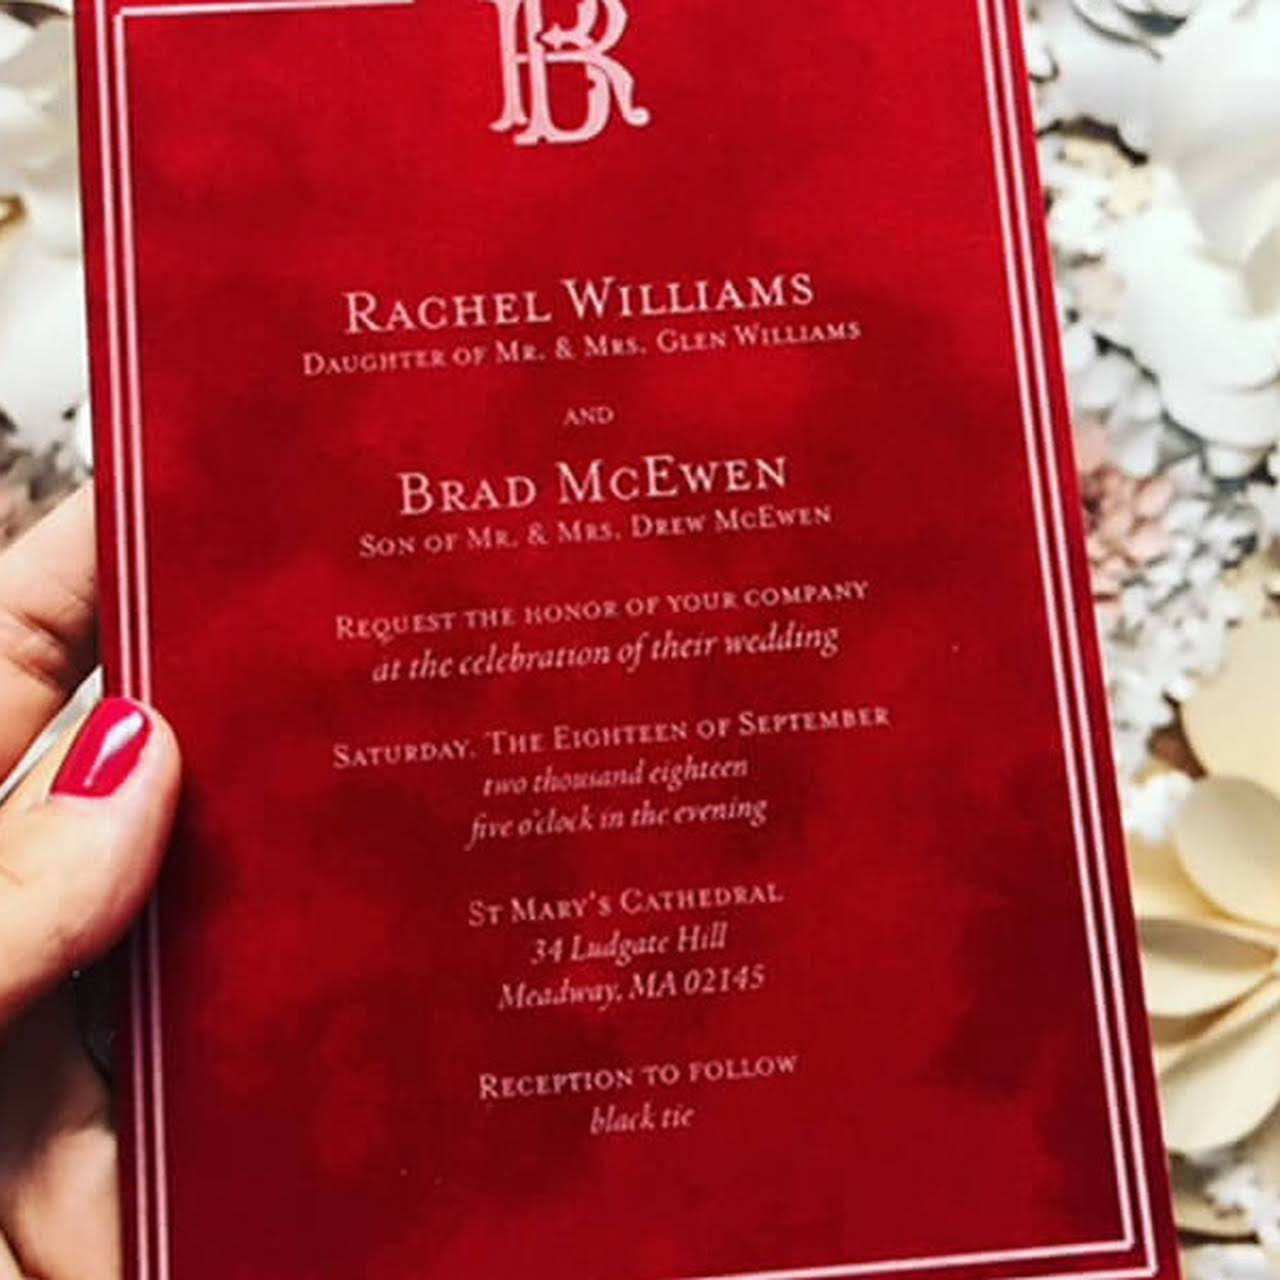 Boxed Wedding Invitations Peabody Ma - Wedding Invitation